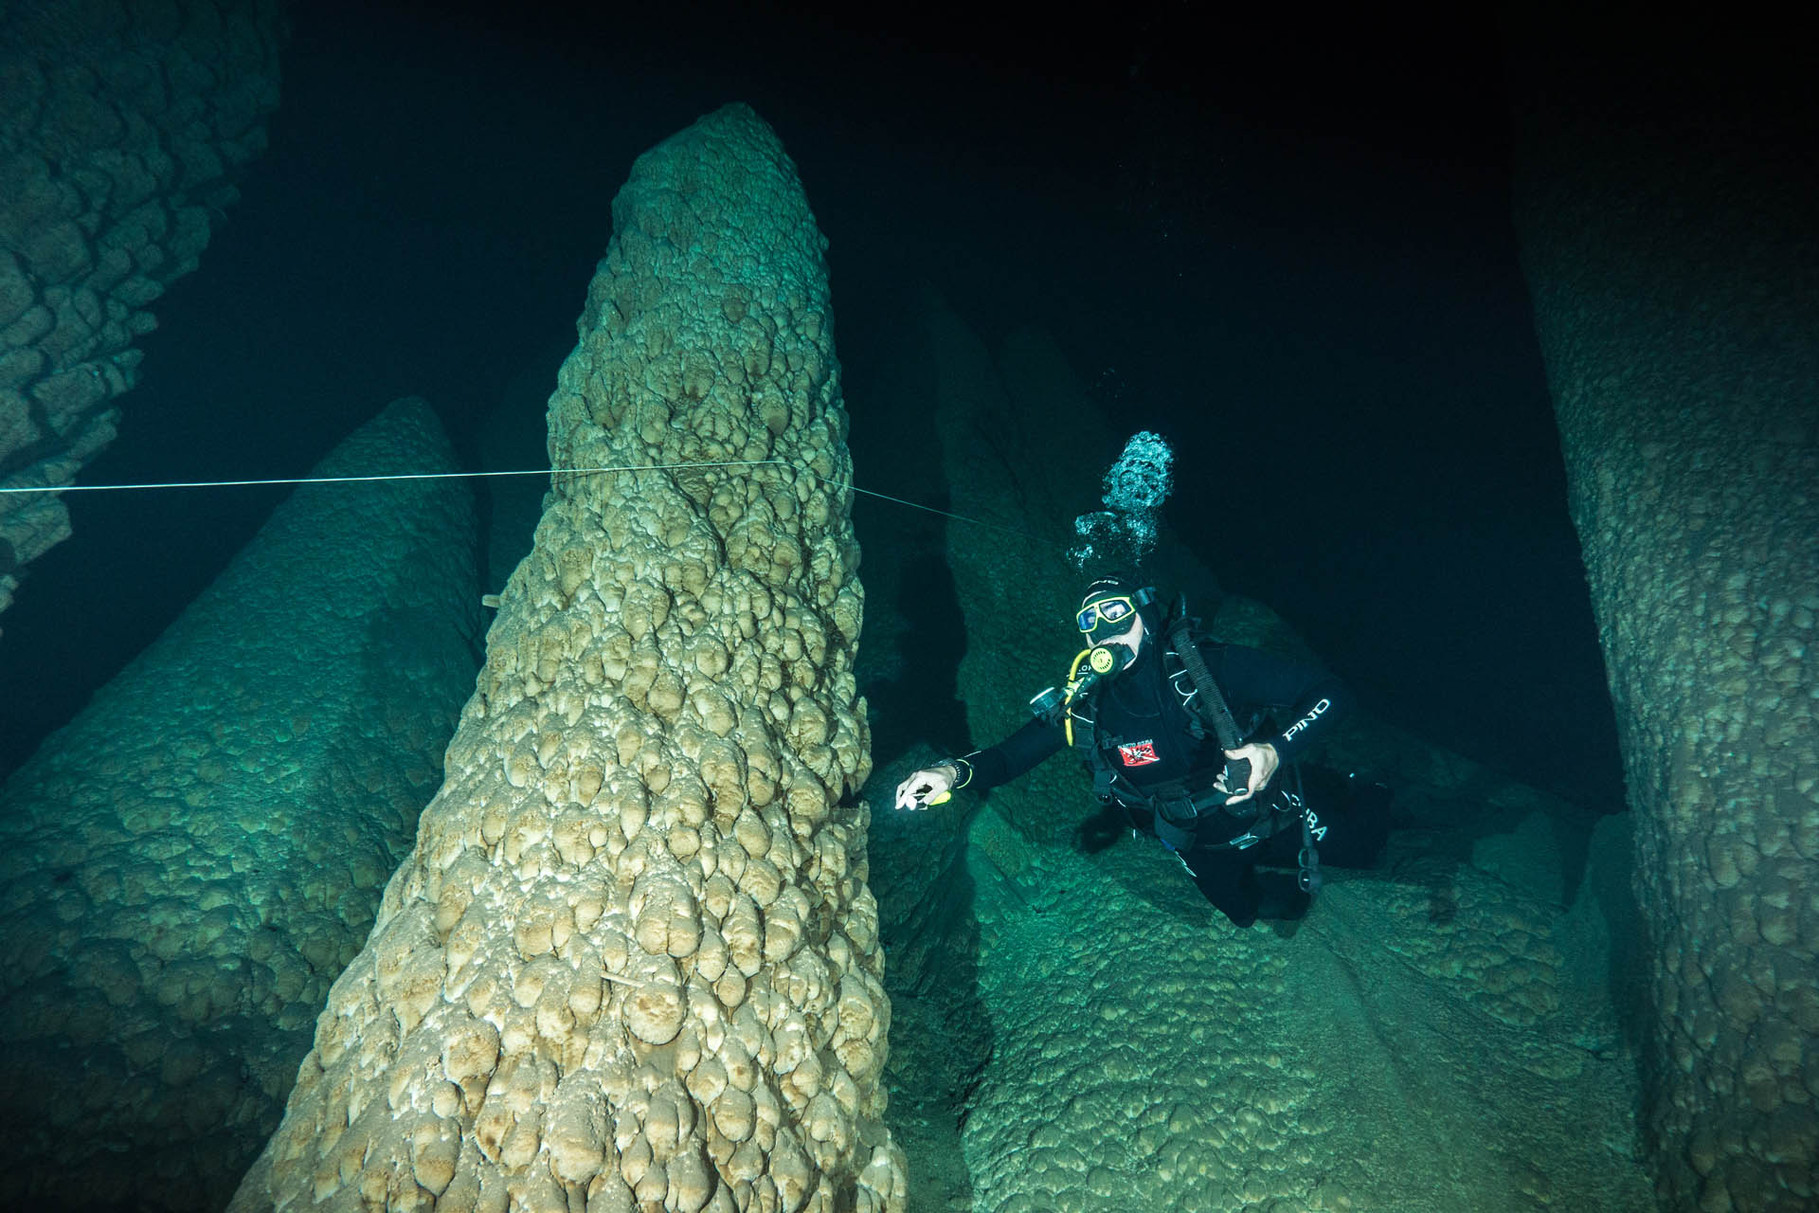 Scuba diving Abismo Anhumas, Bonito